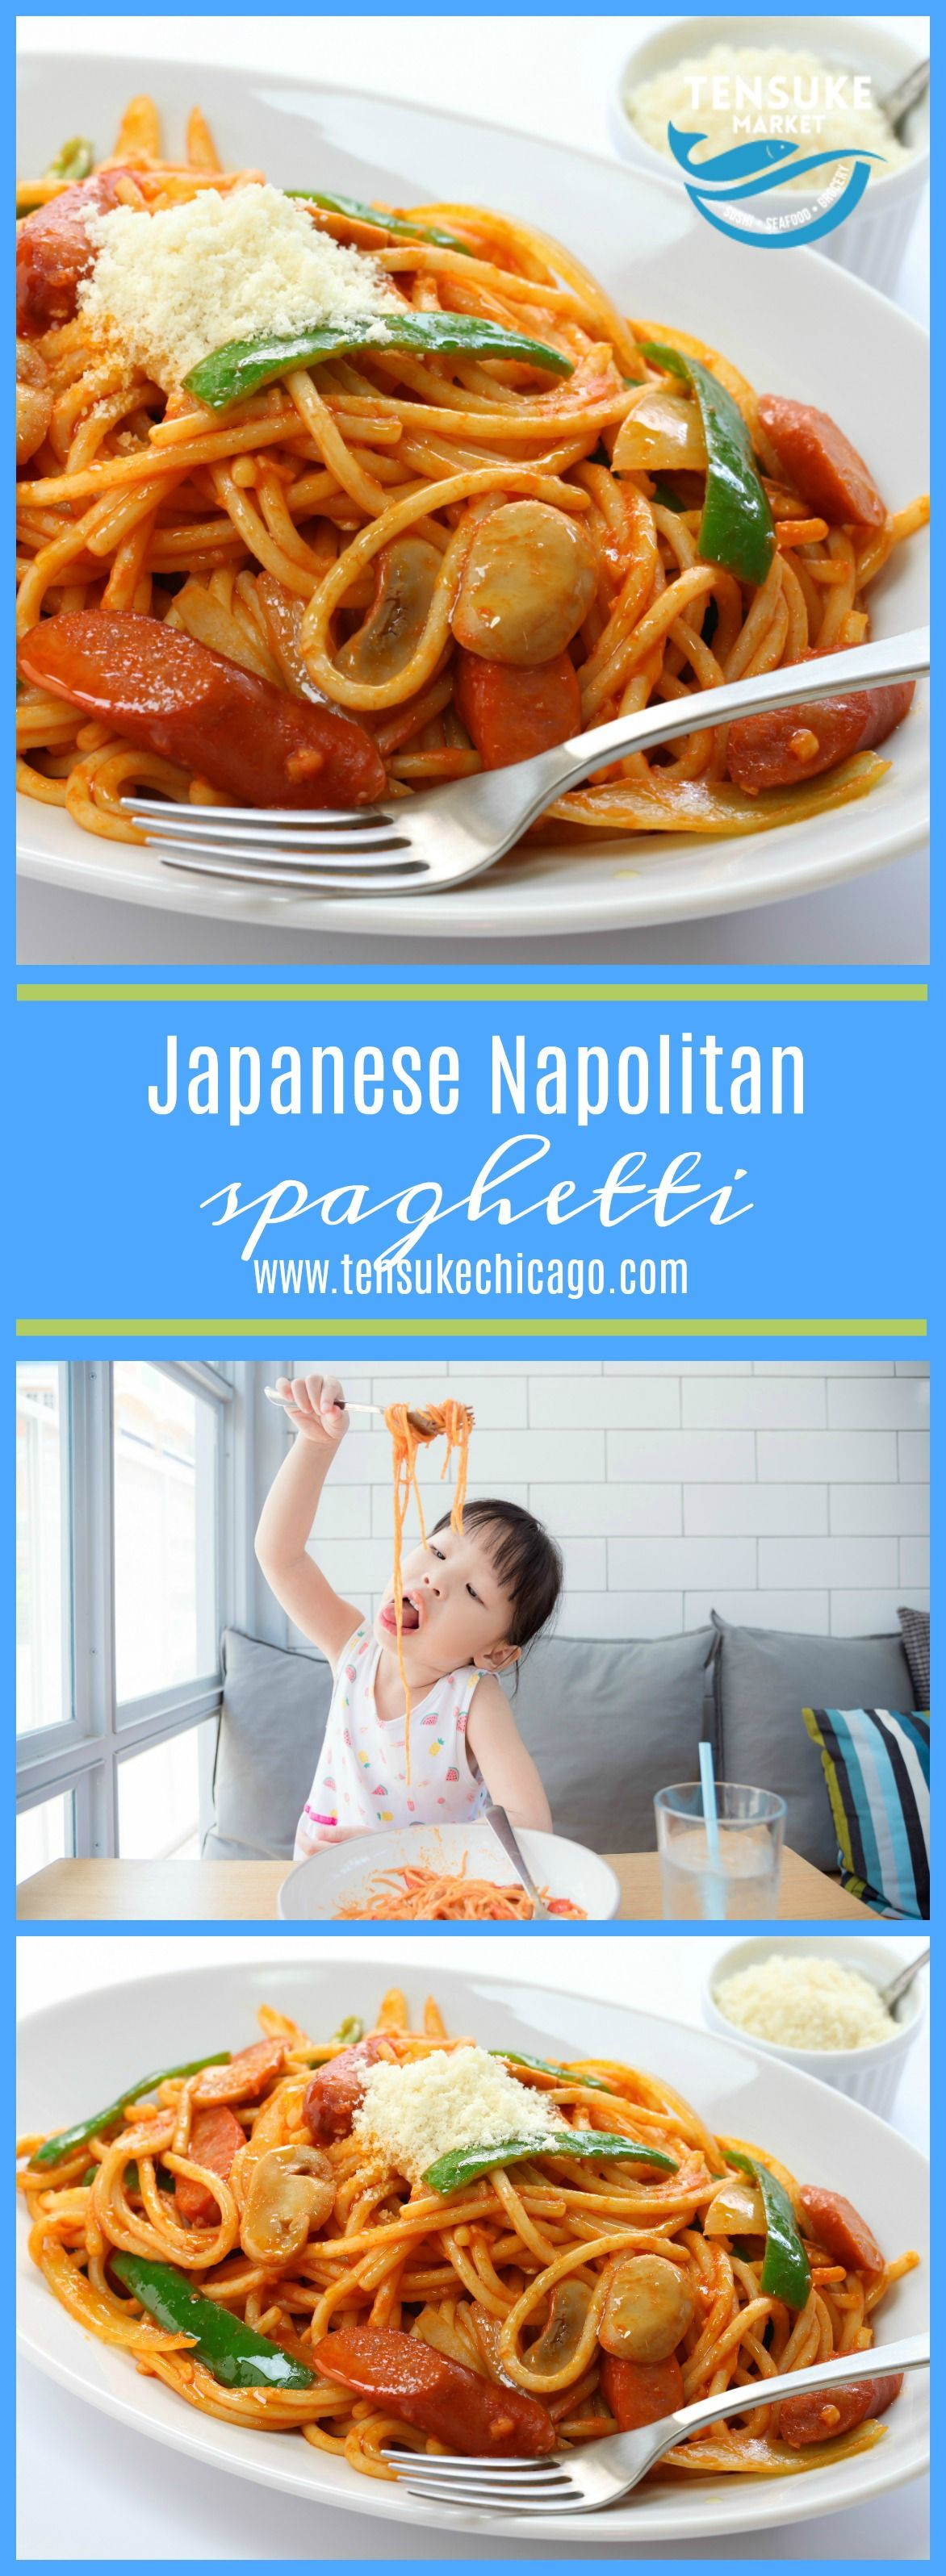 Japanese Napolitan Spaghetti #japanesefood #spaghetti #chicagofood #japanesemarket